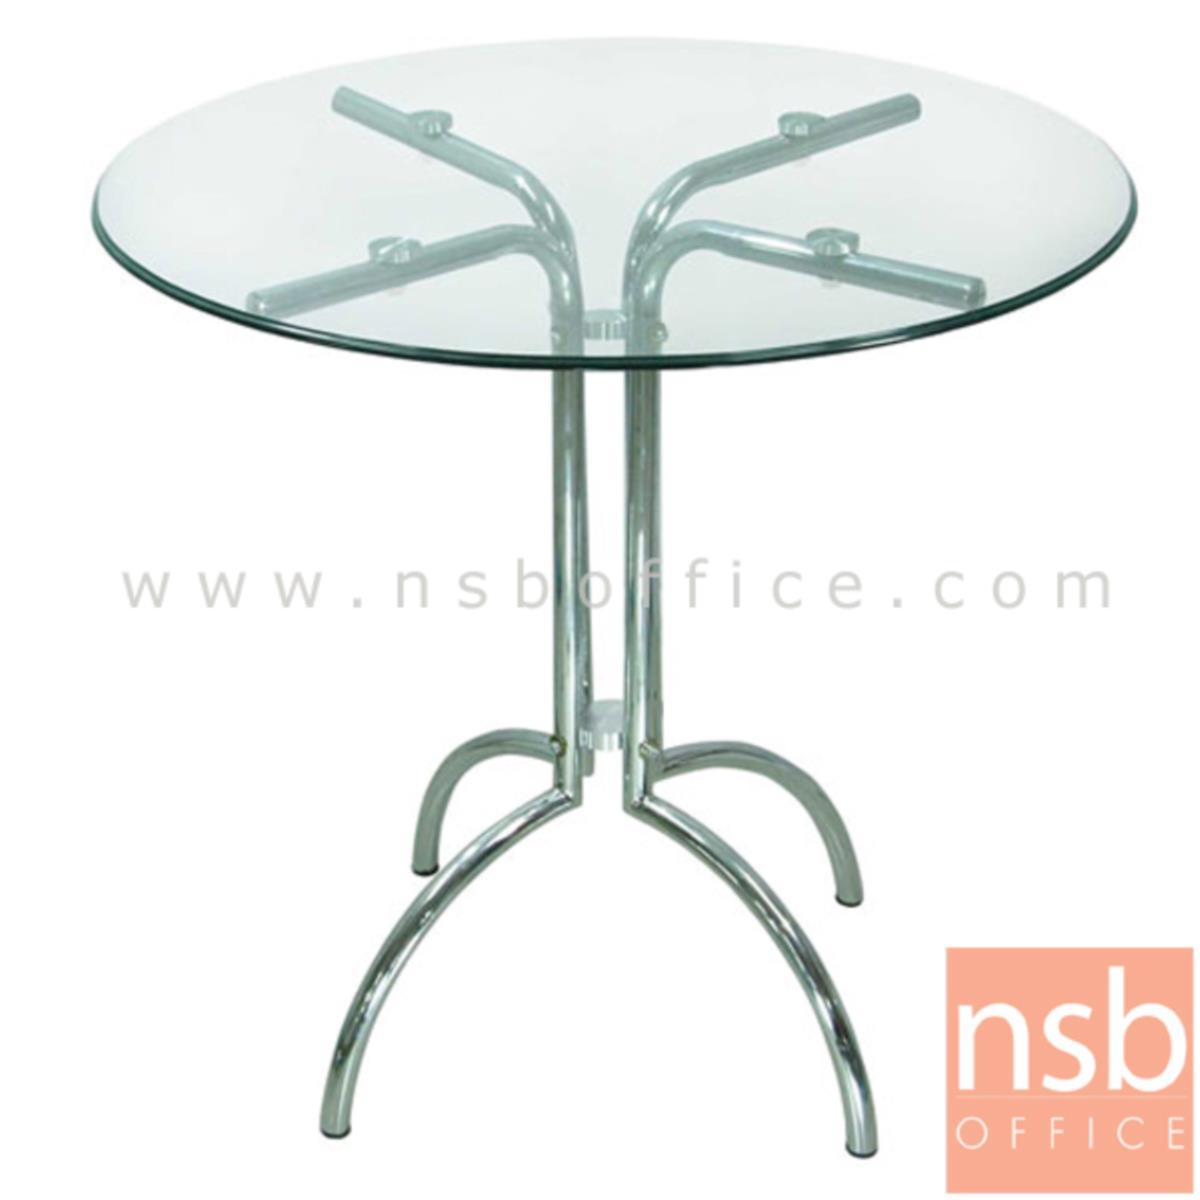 A09A050:โต๊ะกลมหน้ากระจก รุ่น Errol (เออร์รอล) ขนาด 80Di cm.  โครงขาเหล็กชุบโครเมี่ยม ขาคู่ 4 แฉก